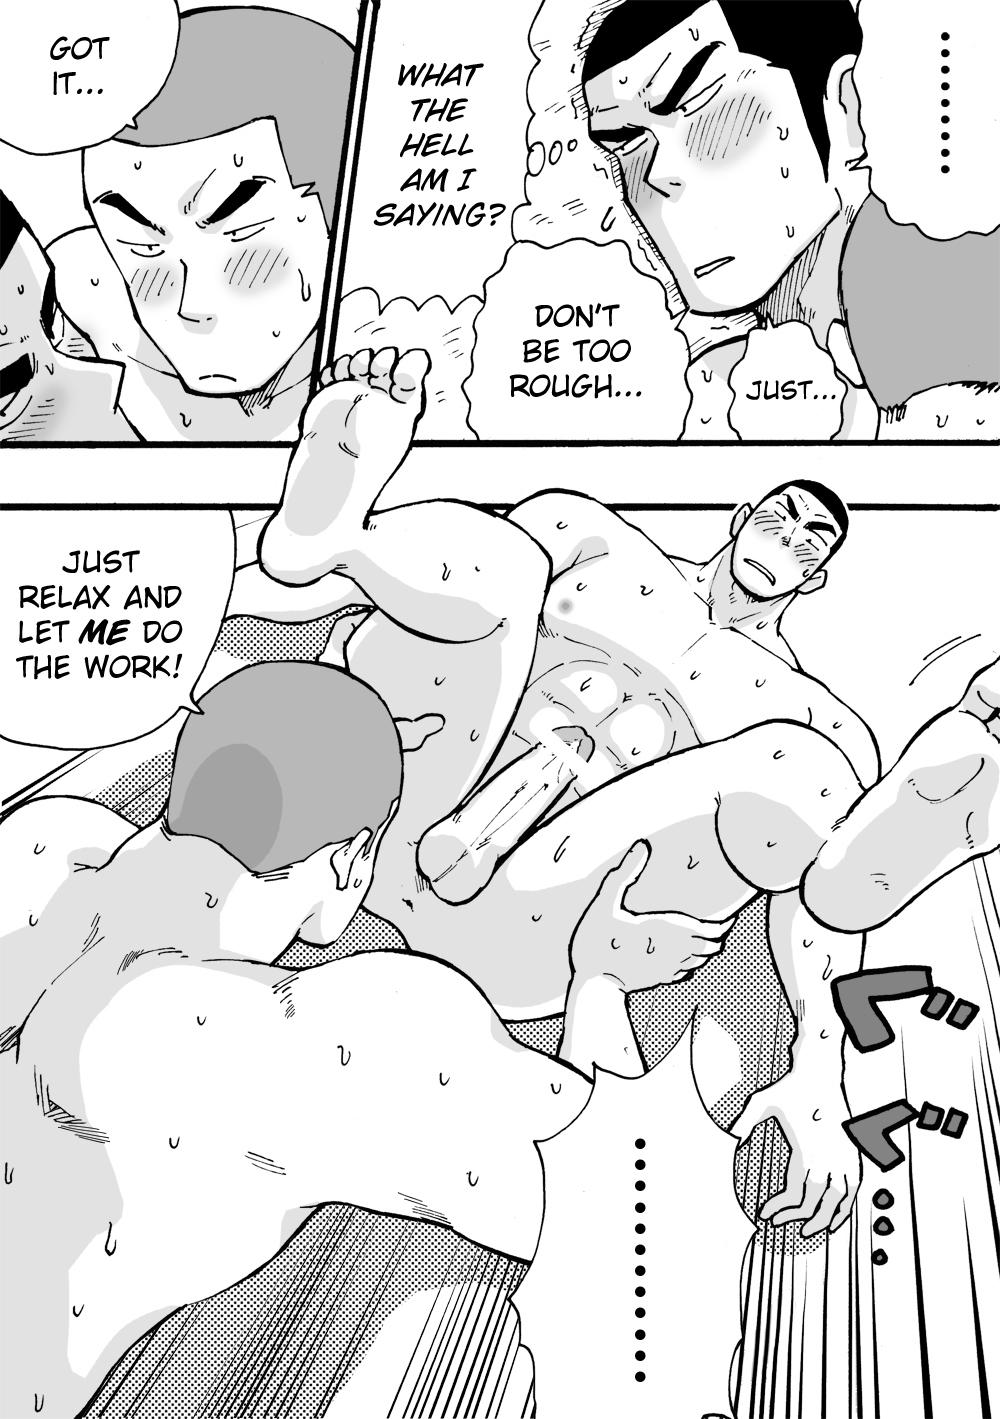 [Akahachi] Motemote Yakyuubu Otoko [Kouhen] | Popular Baseball Club Boys (Part Two) [English] [Papatez] 35